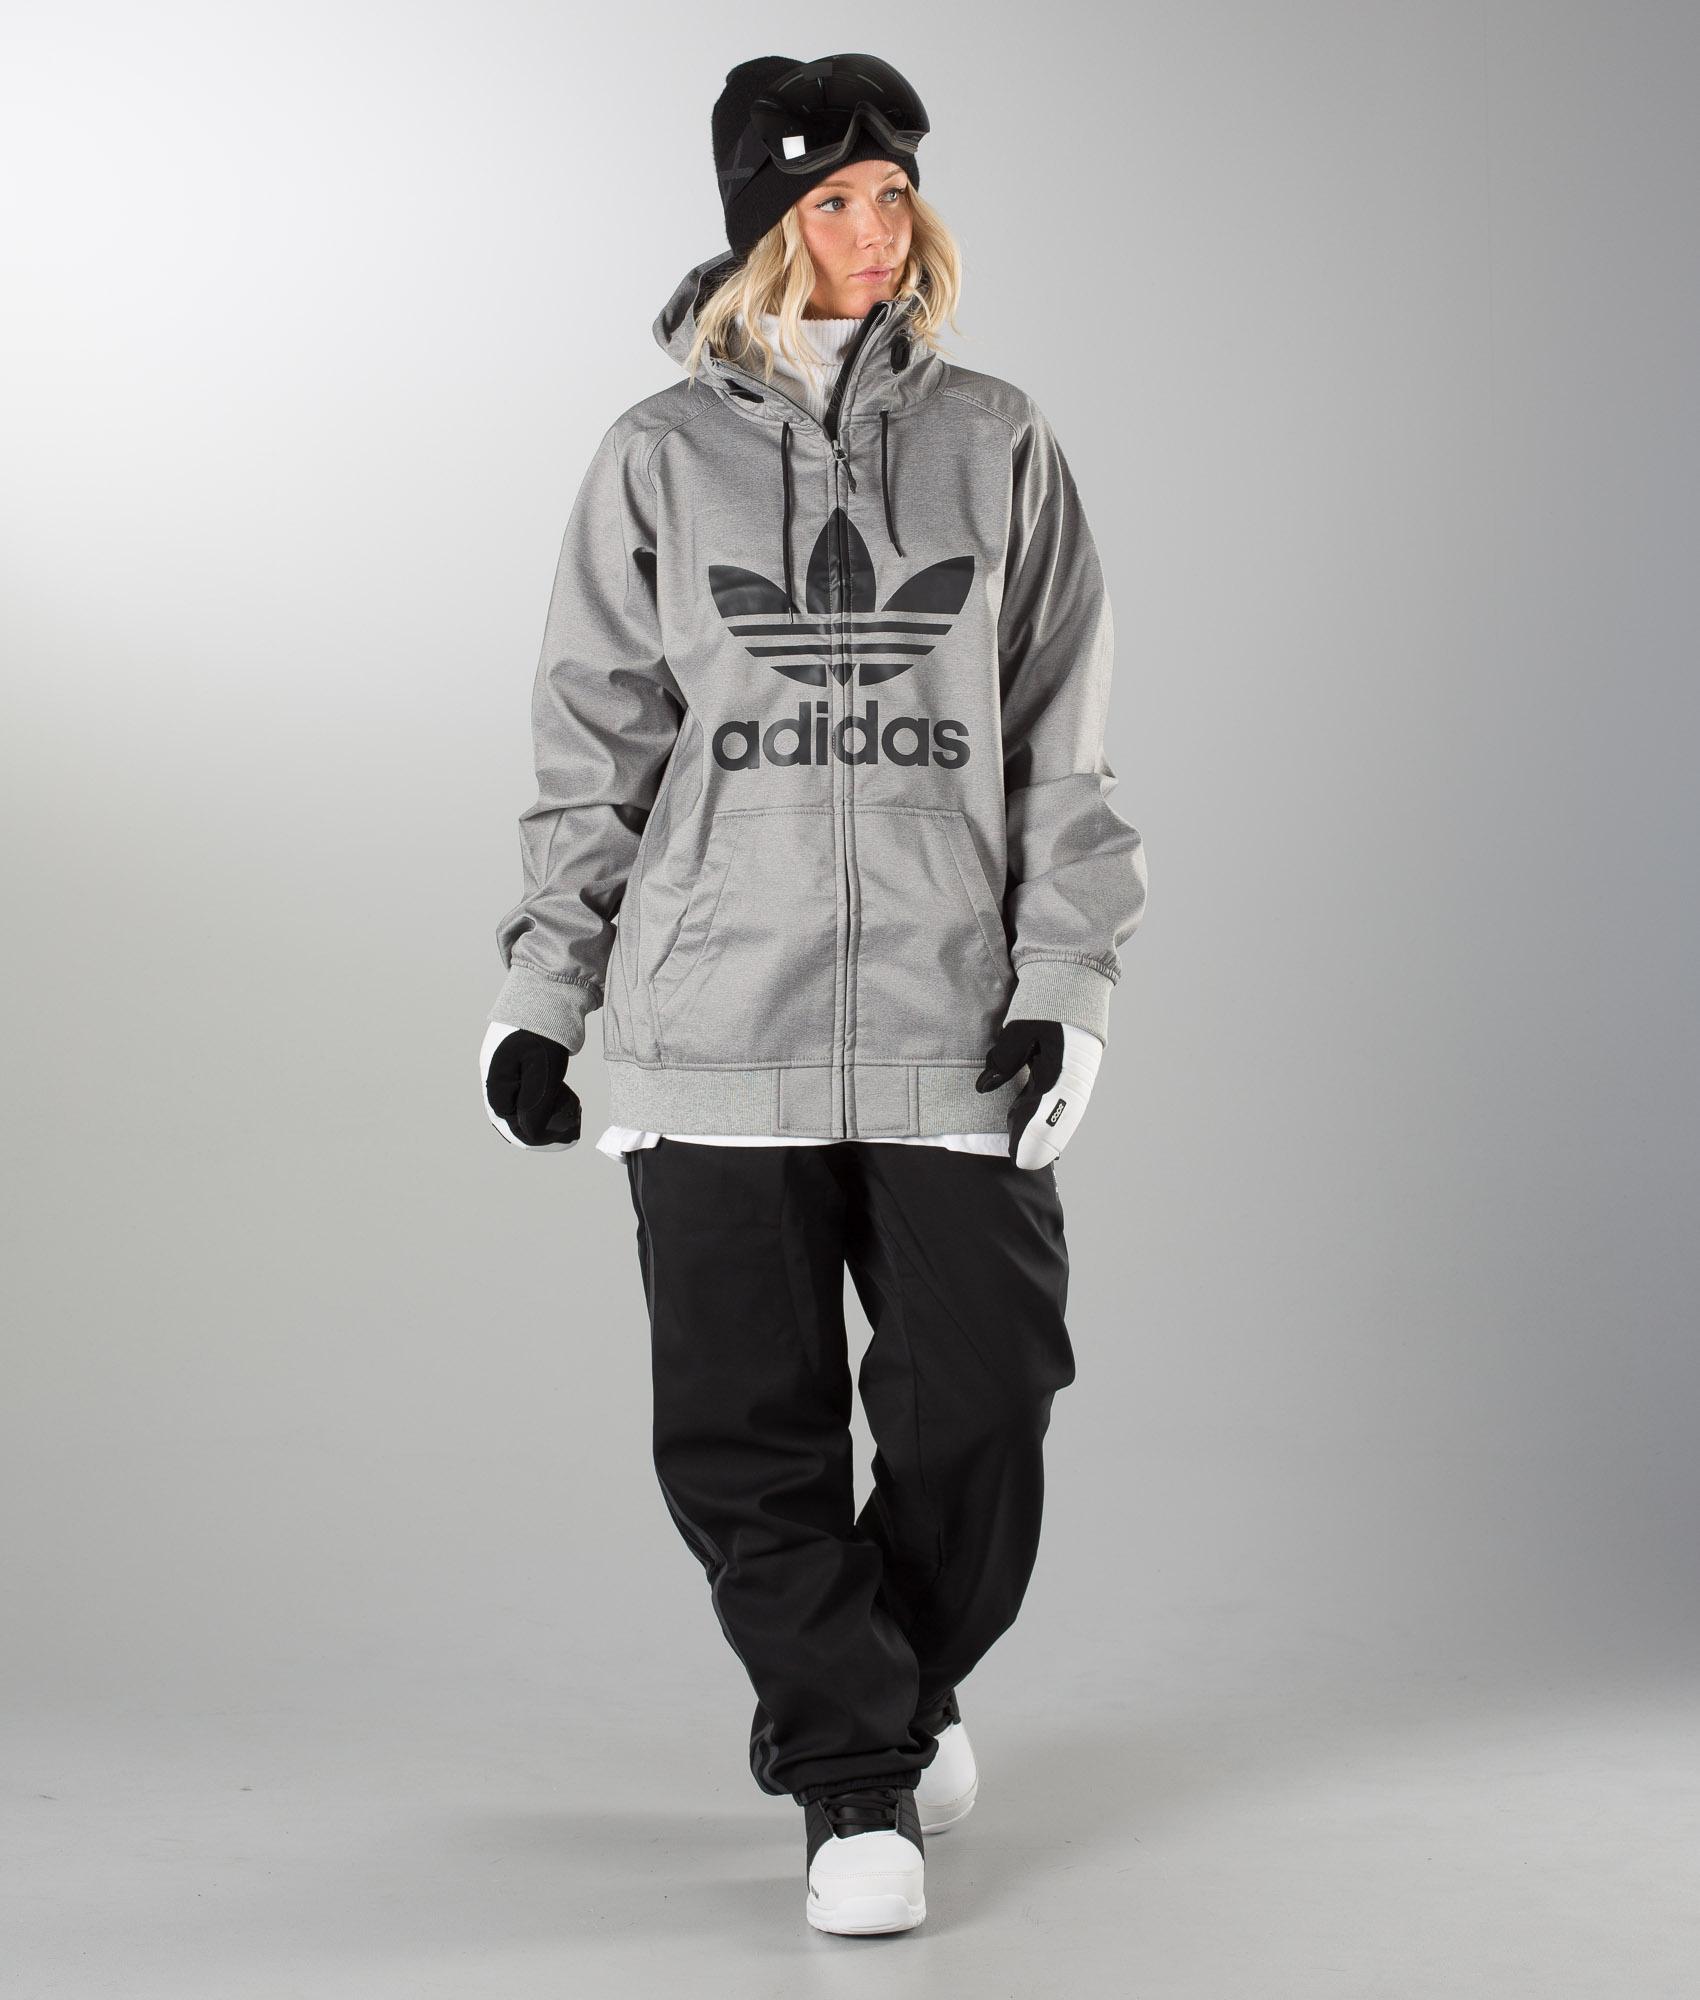 Giacca Corhtrblack Unisex Snowboarding Greeley Adidas Da Snowboard nFP0CwPqa